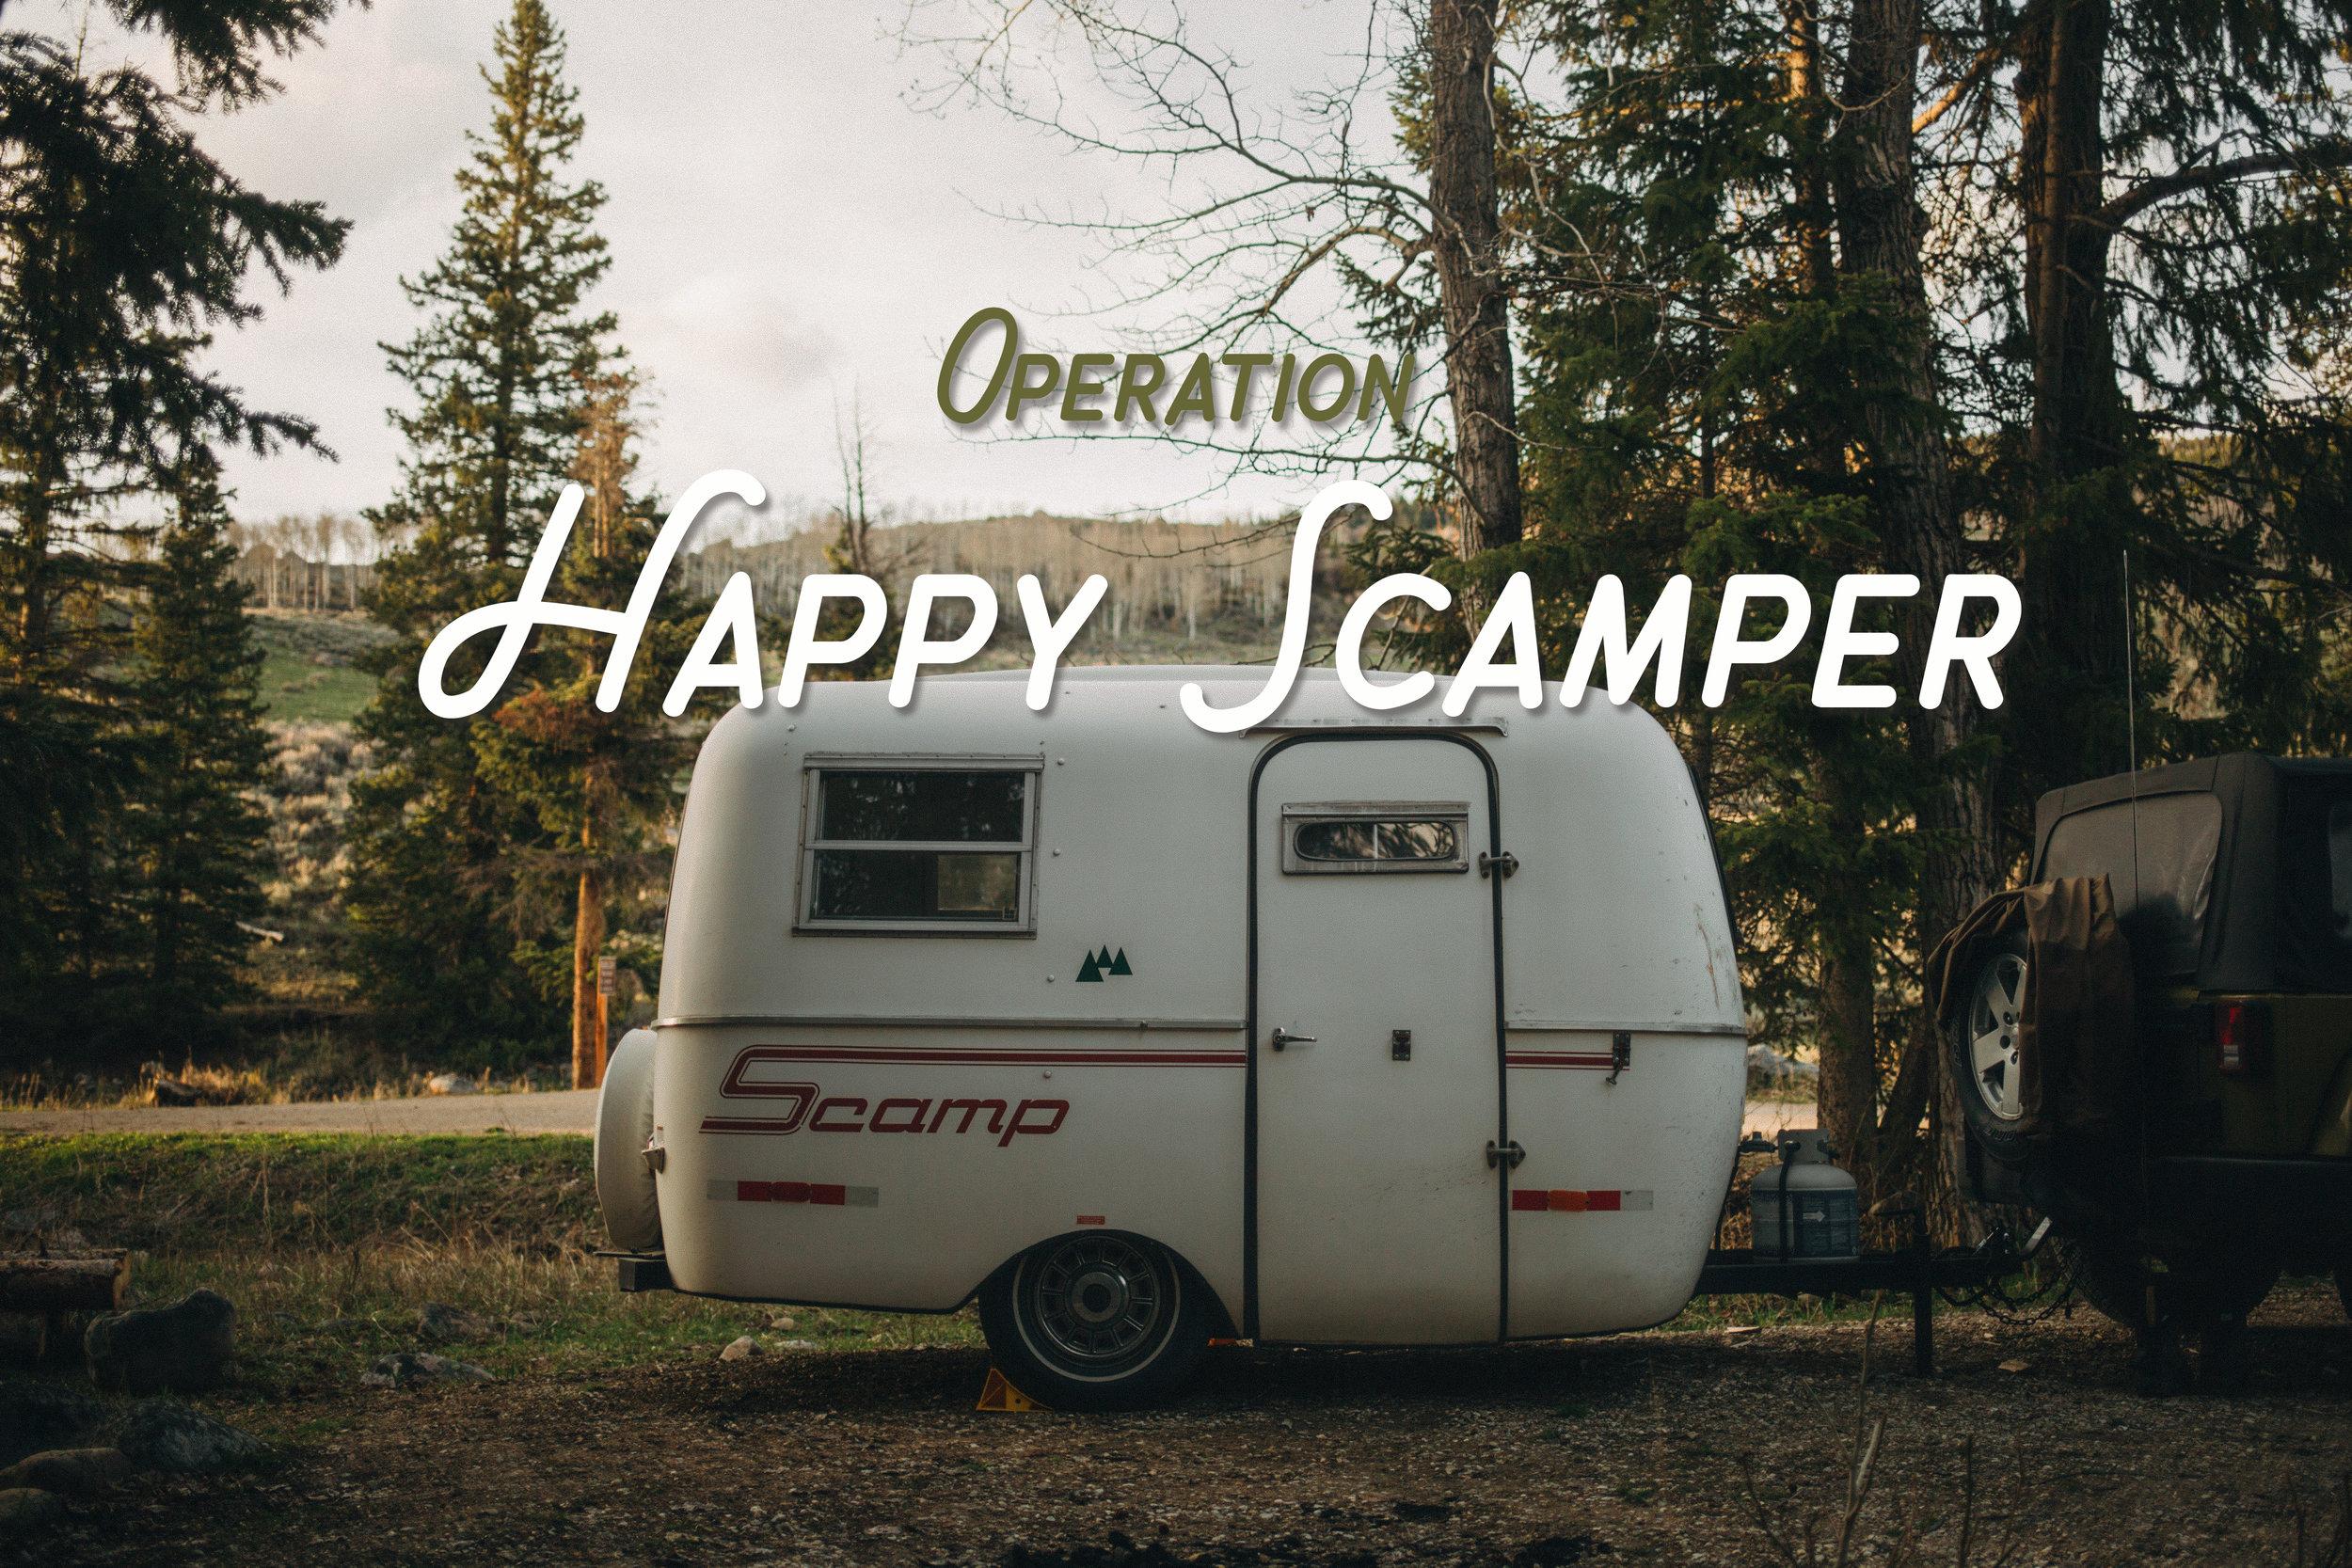 NSR_HappyScamper_logo.jpg